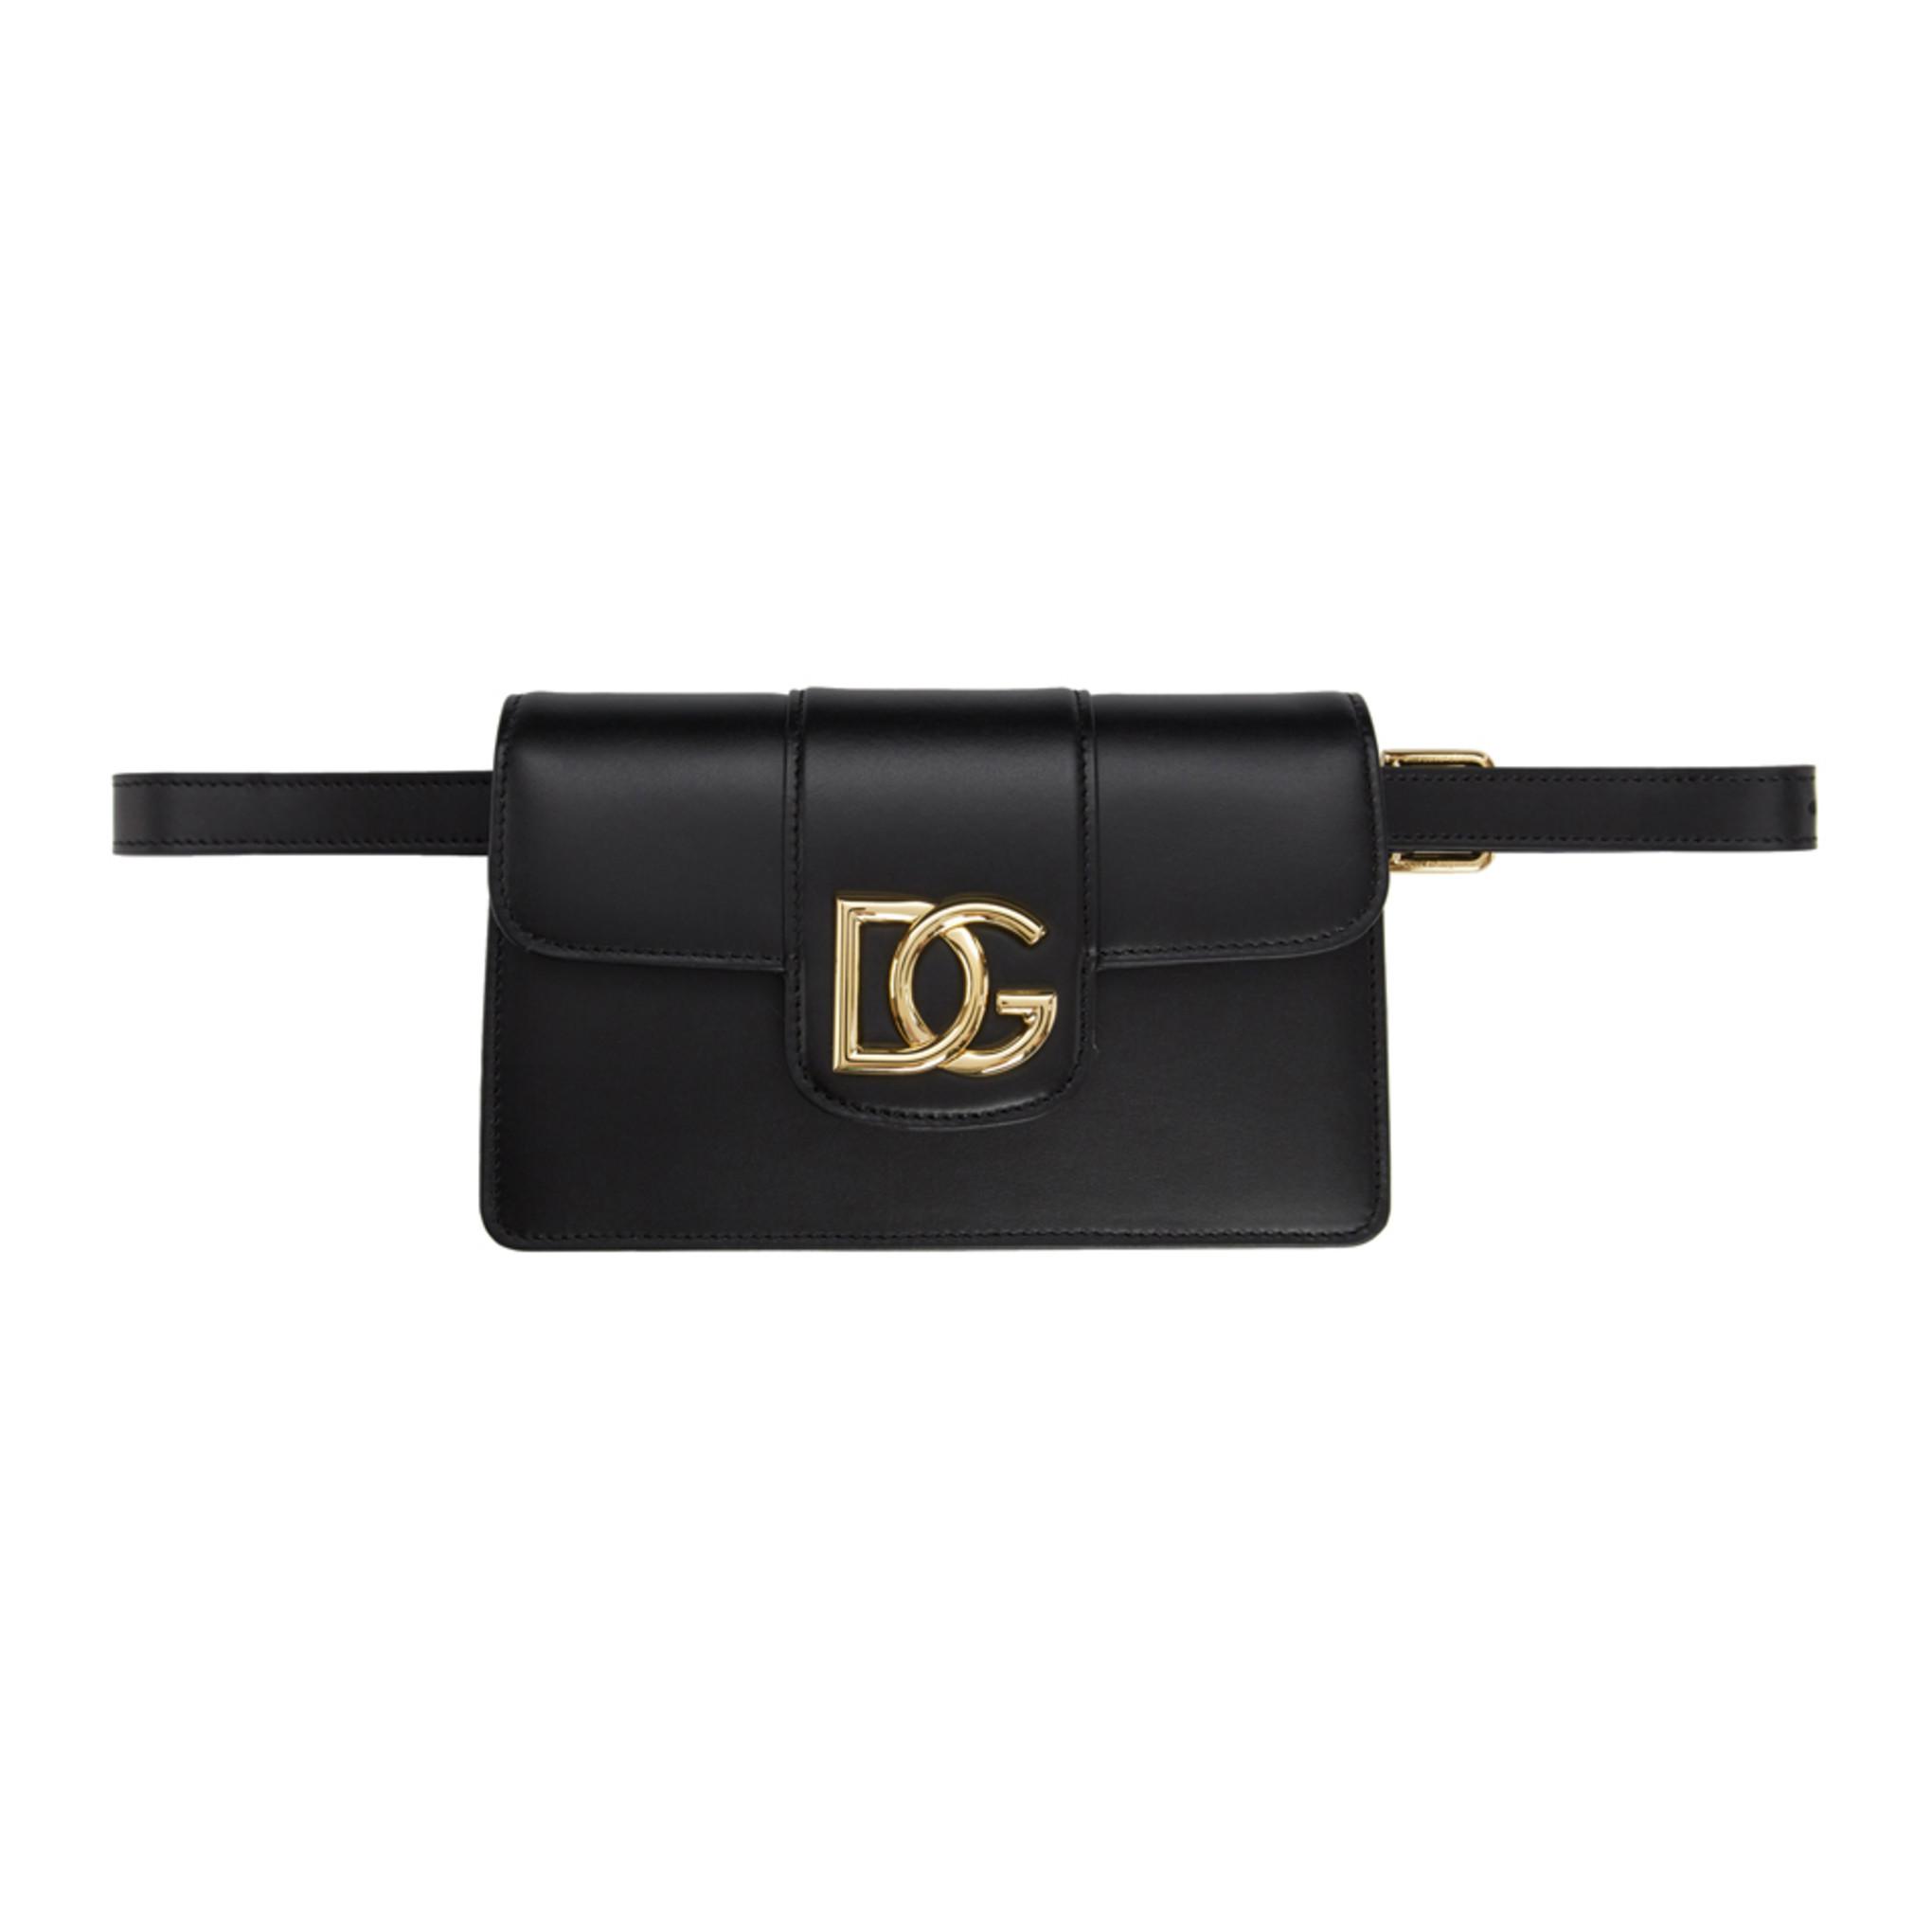 Black Hw 'dg' Belt Bag by Dolce & Gabbana